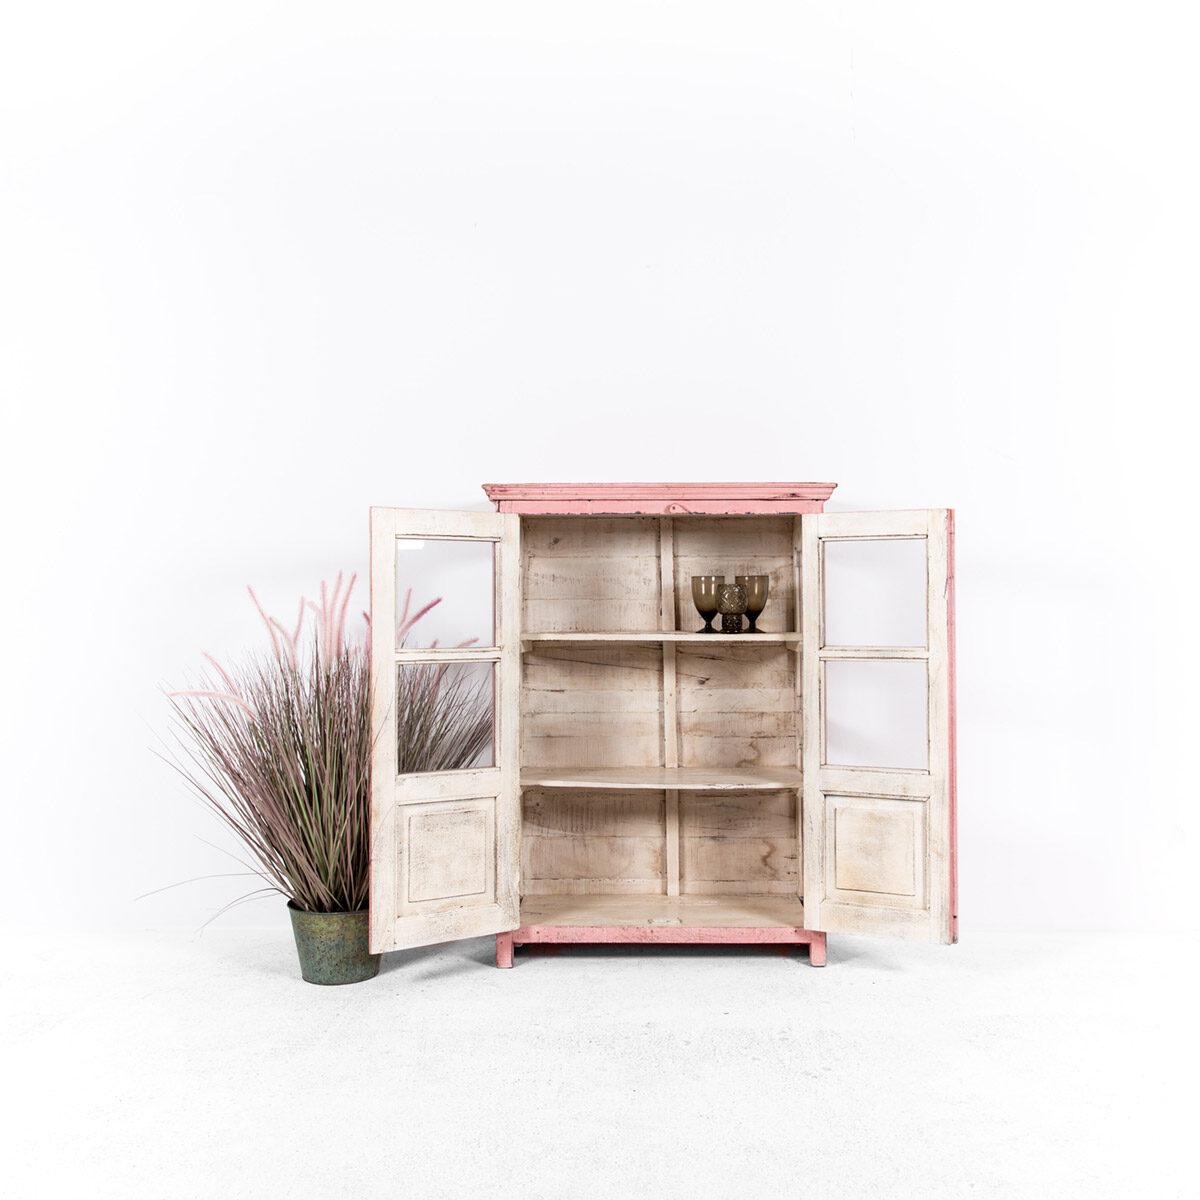 Roze-vitrinekast-2-glazen-deuren-3